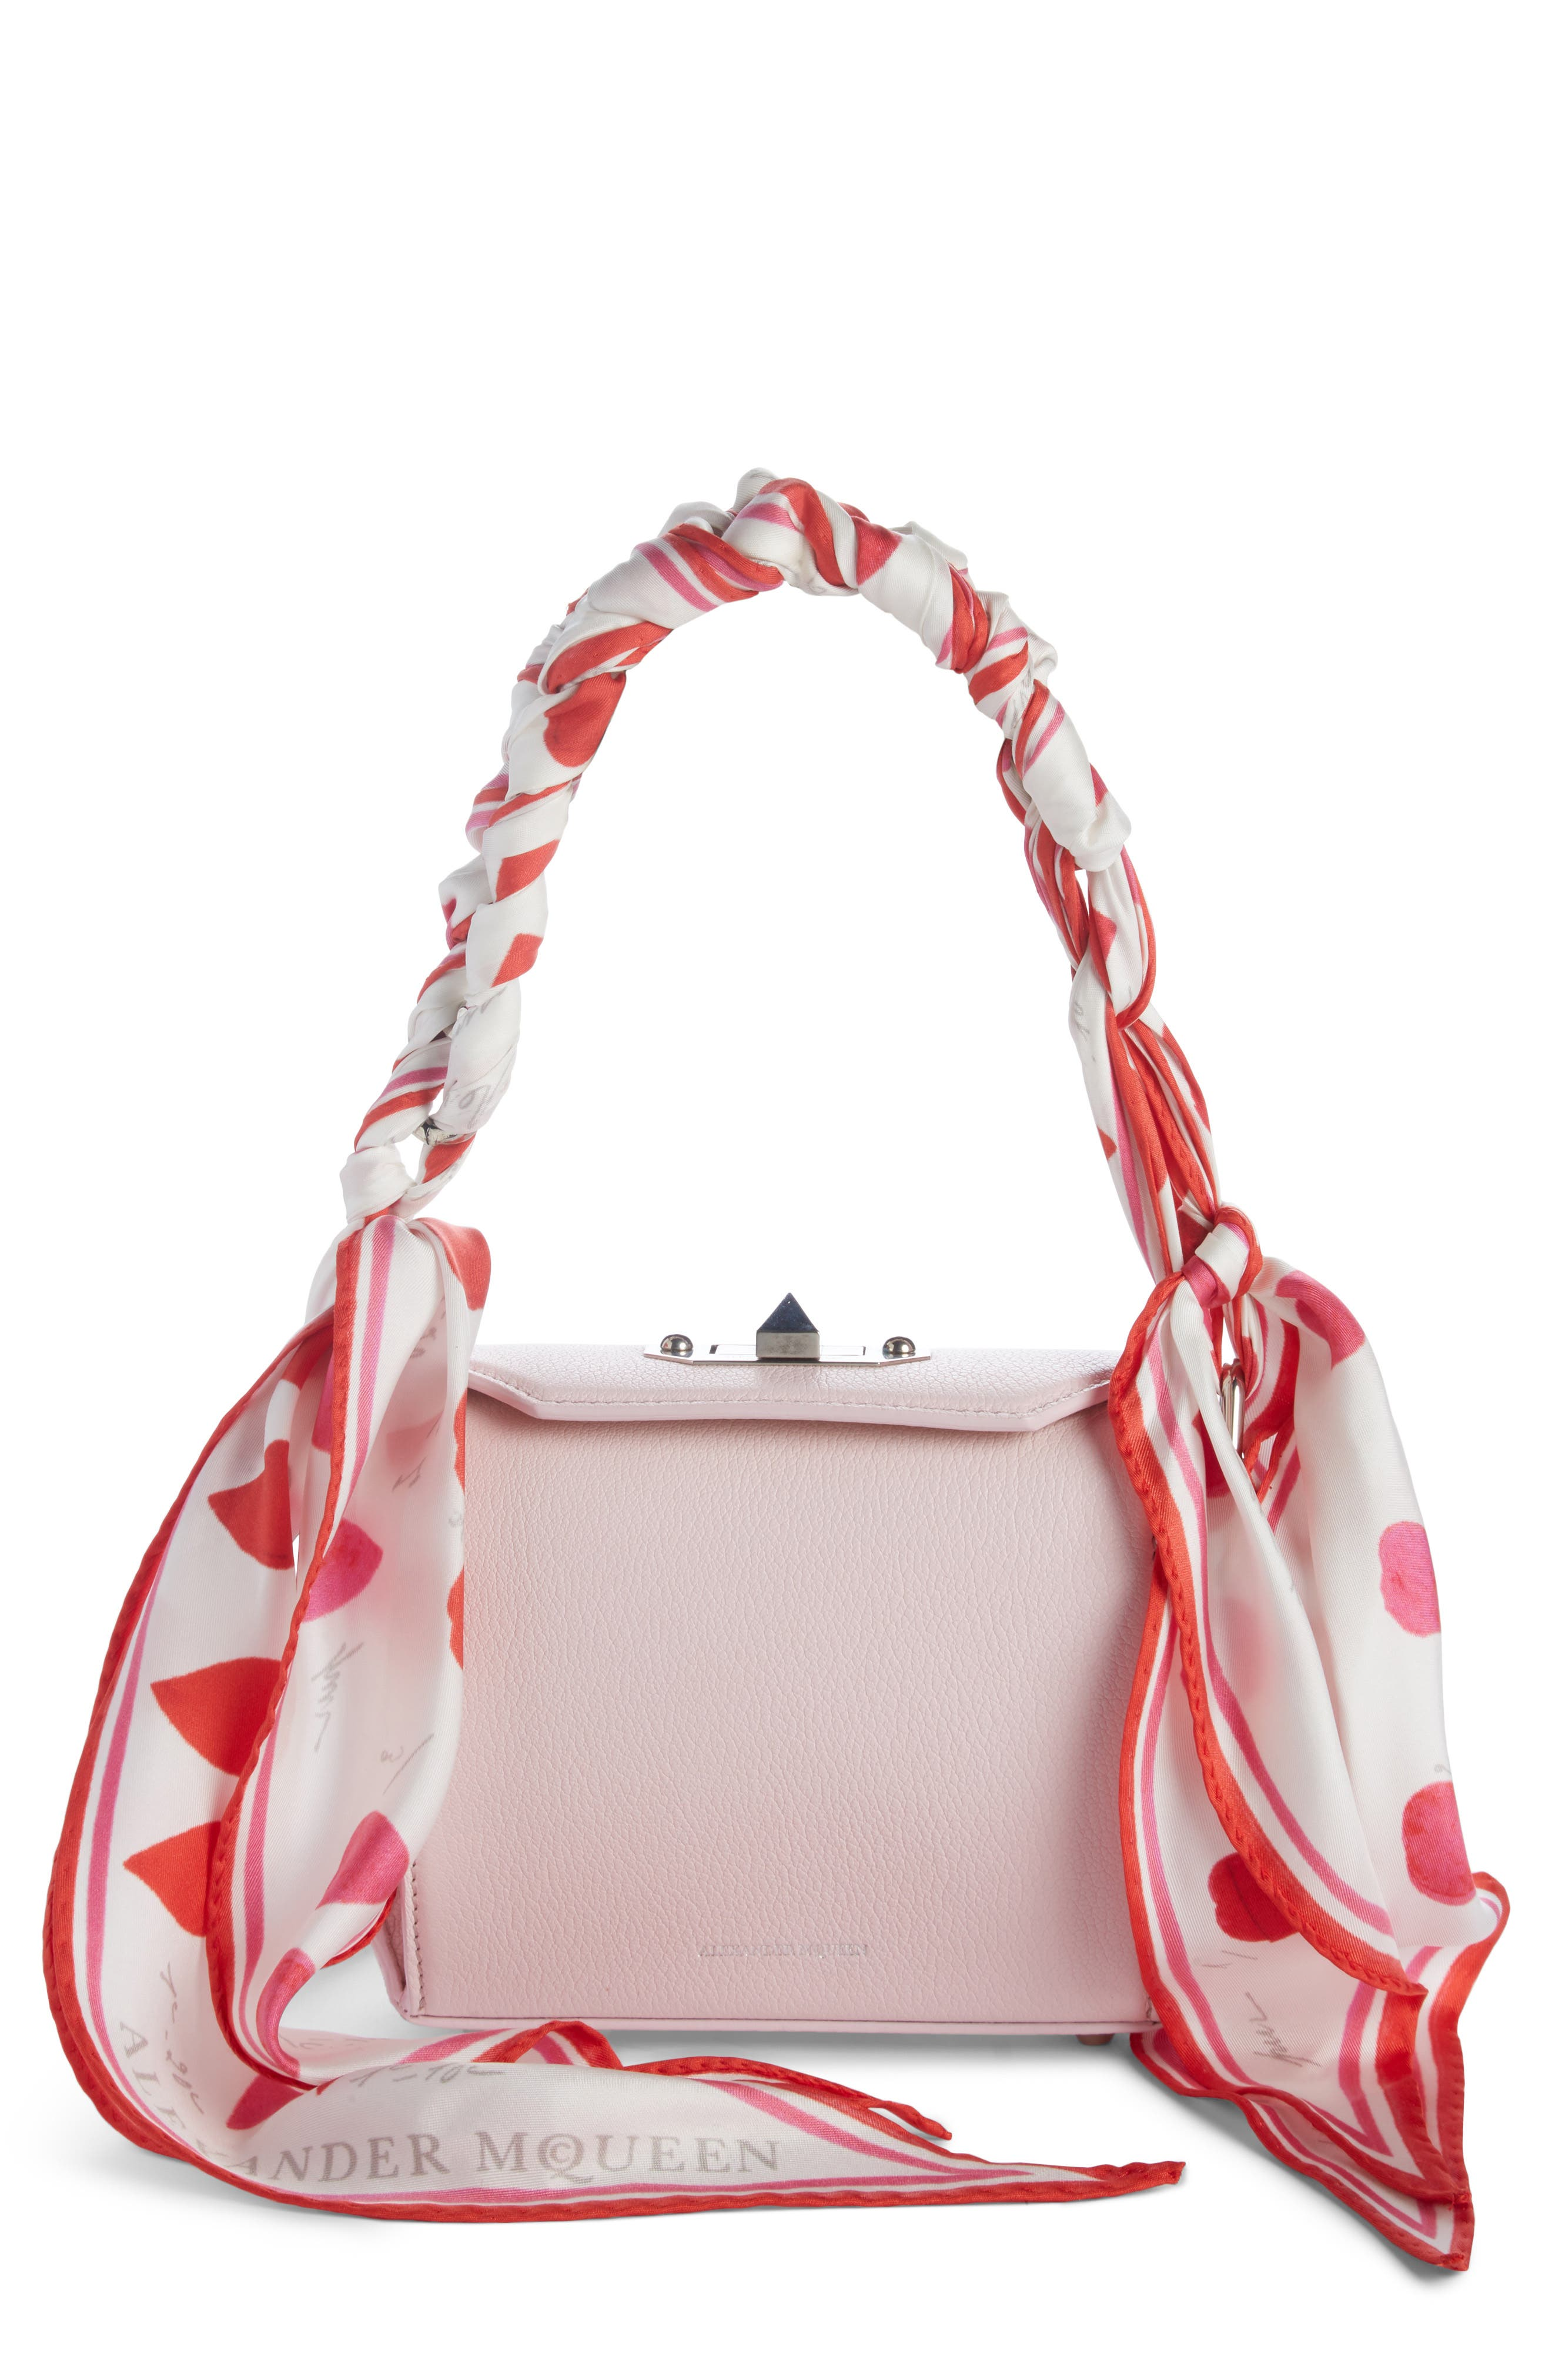 Alexander McQueen Box Bag 16 Leather Bag